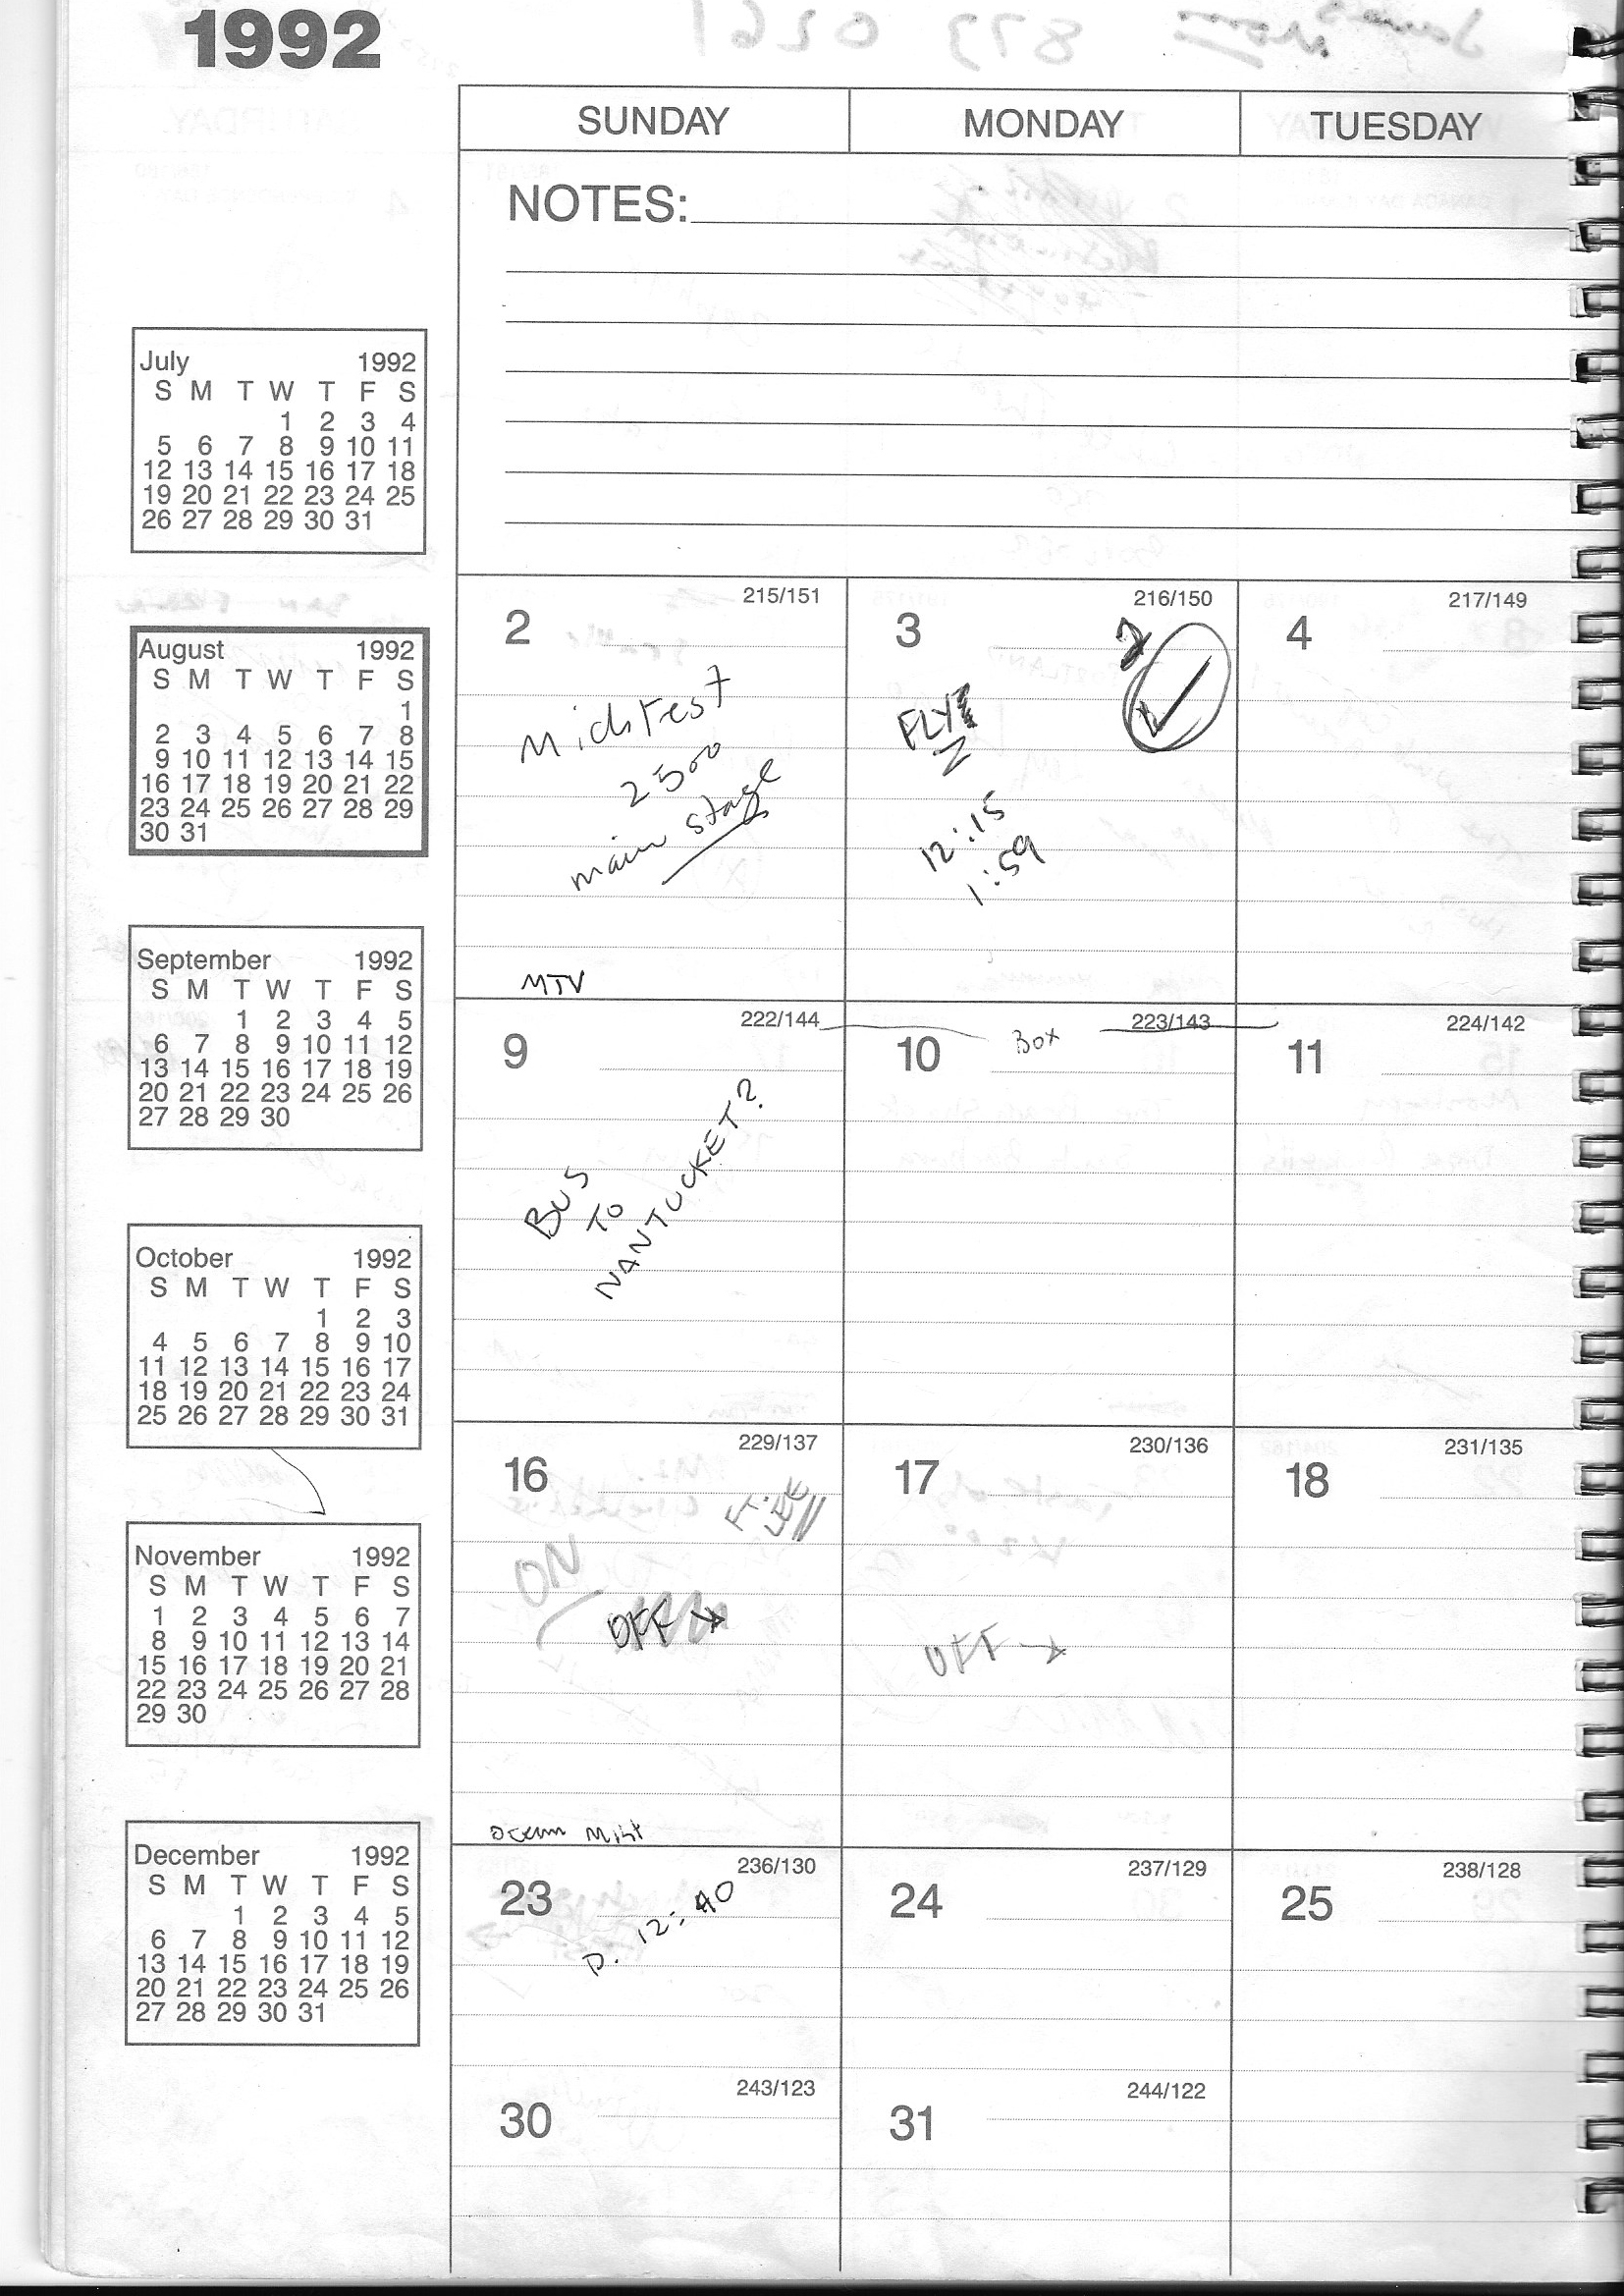 Scan 19.jpg